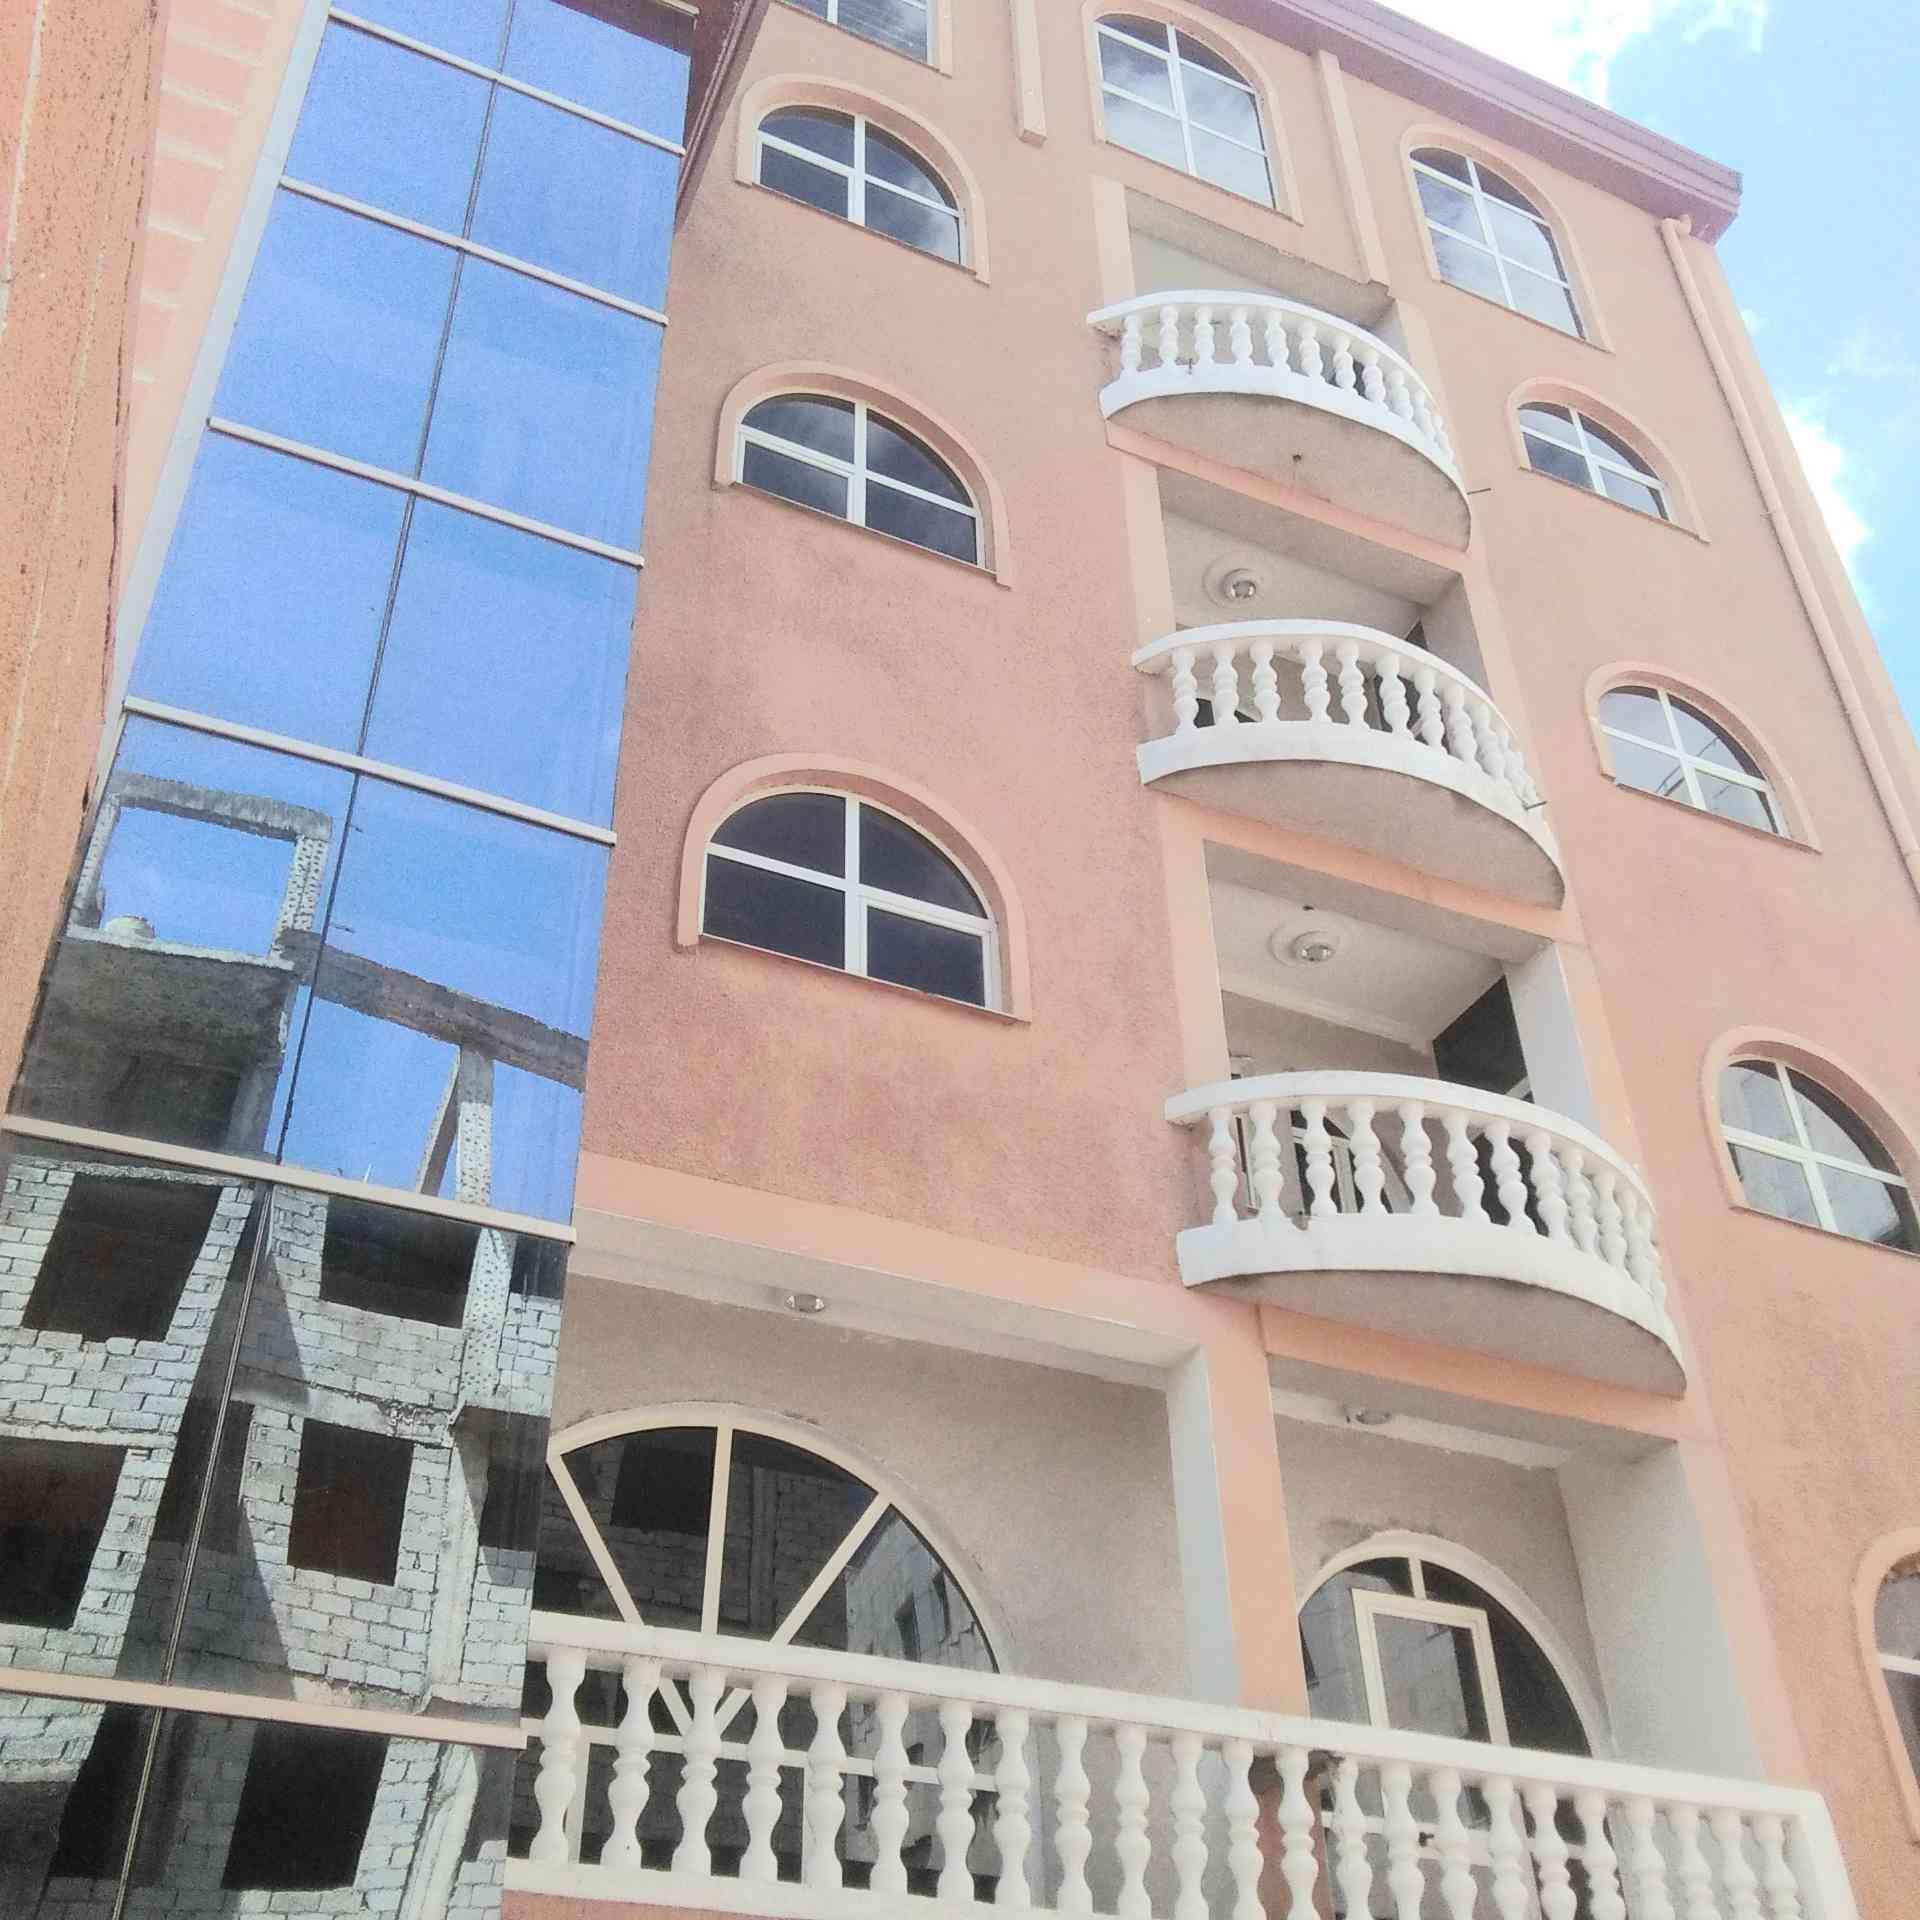 15 Bedroom Building For Rent In Addis Ababa, Gurd Shola